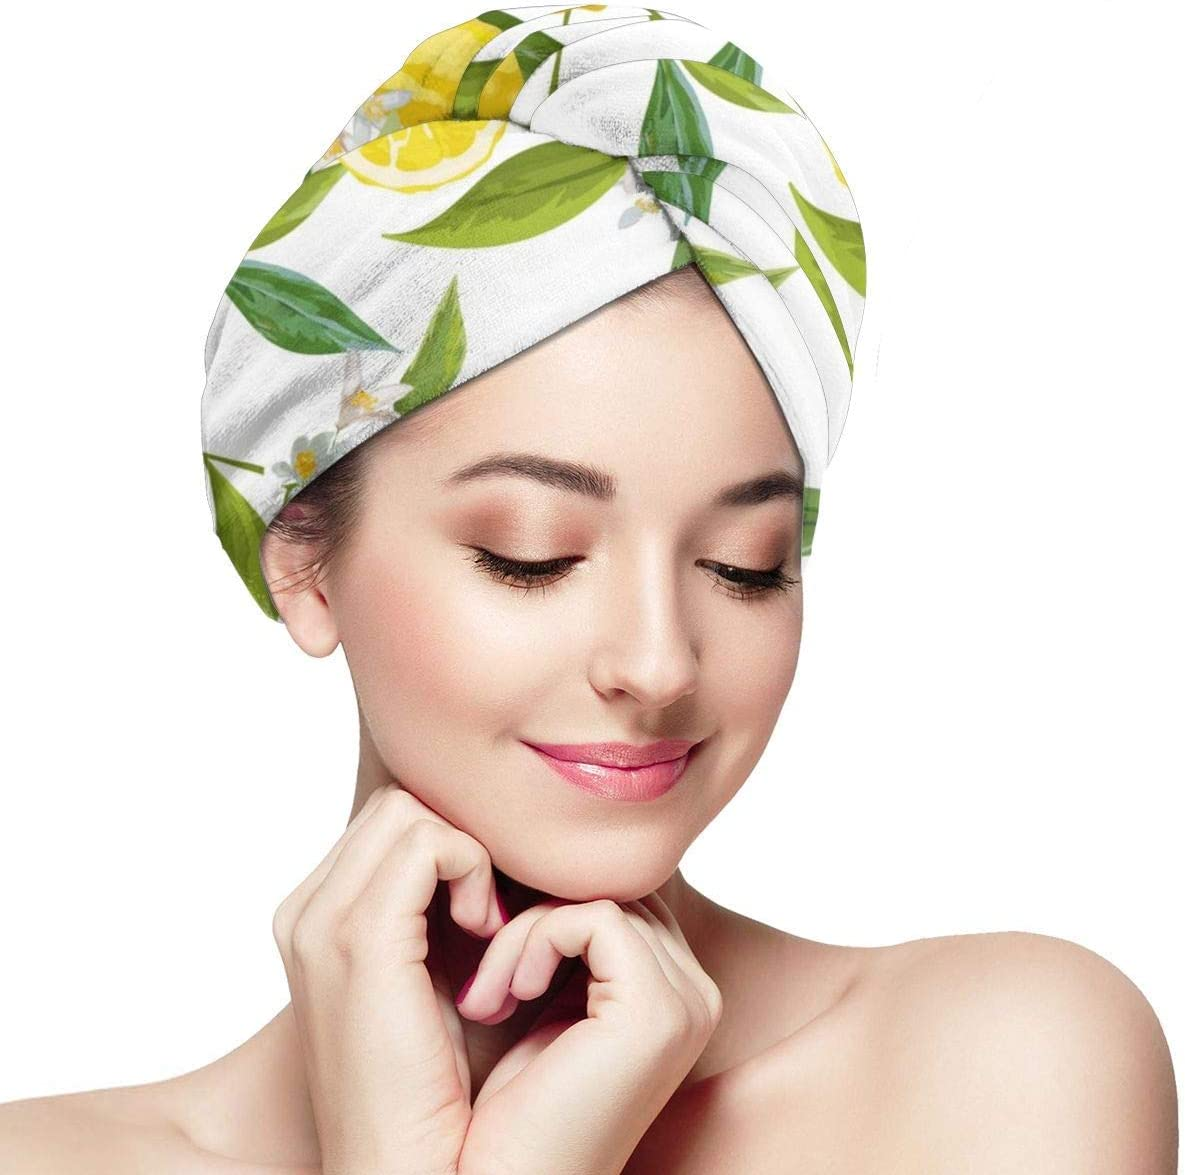 QHMY Toalla para el cabello Wrap Turbante Floral Limón Secado rápido Gorro para el cabello Microfibra Secado Baño Ducha Toalla con botones